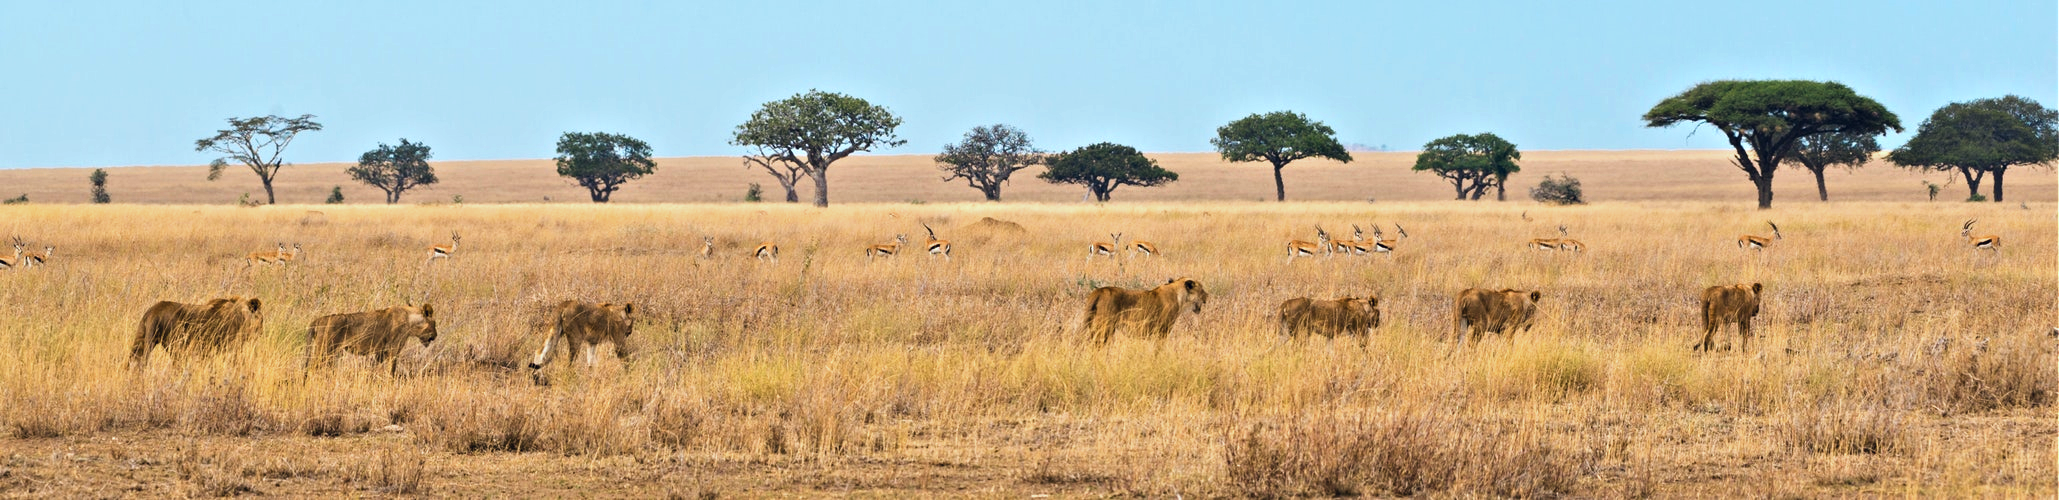 Slider South Africa lion and springbok British and Irish Lions 2021